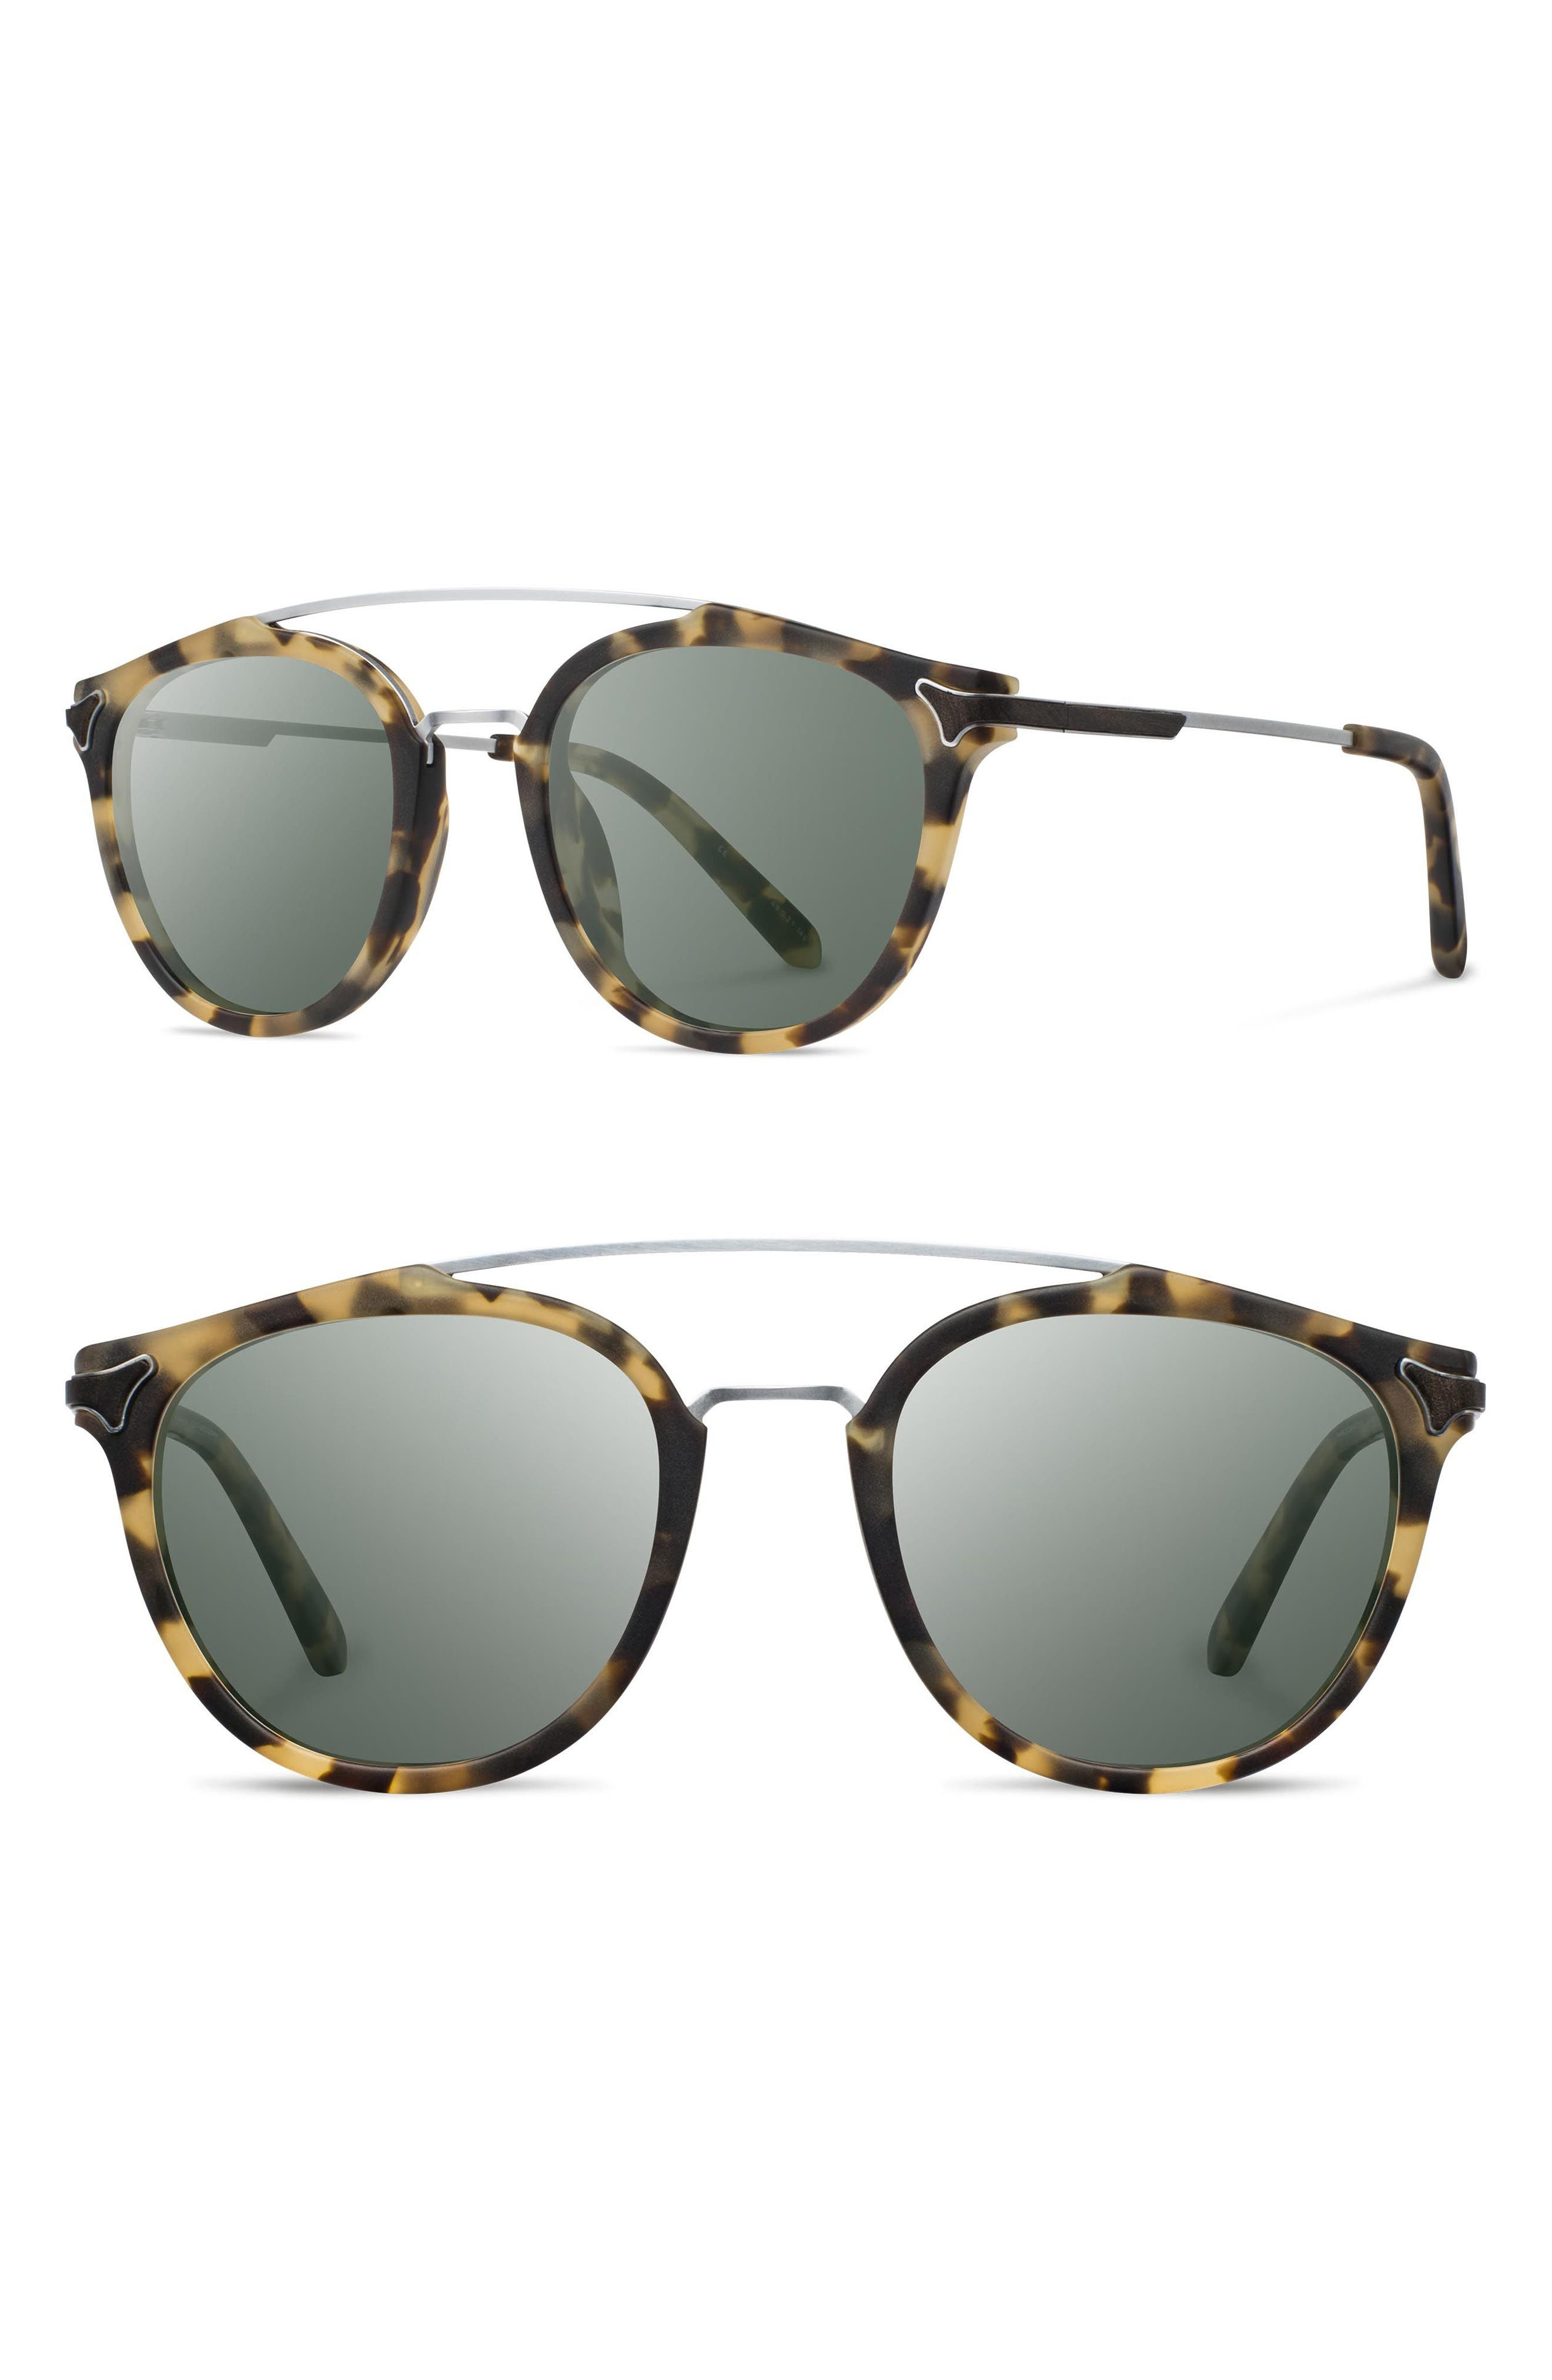 Kinsrow 49mm Acetate & Wood Sunglasses,                         Main,                         color, MATTE HAVANA/ G15